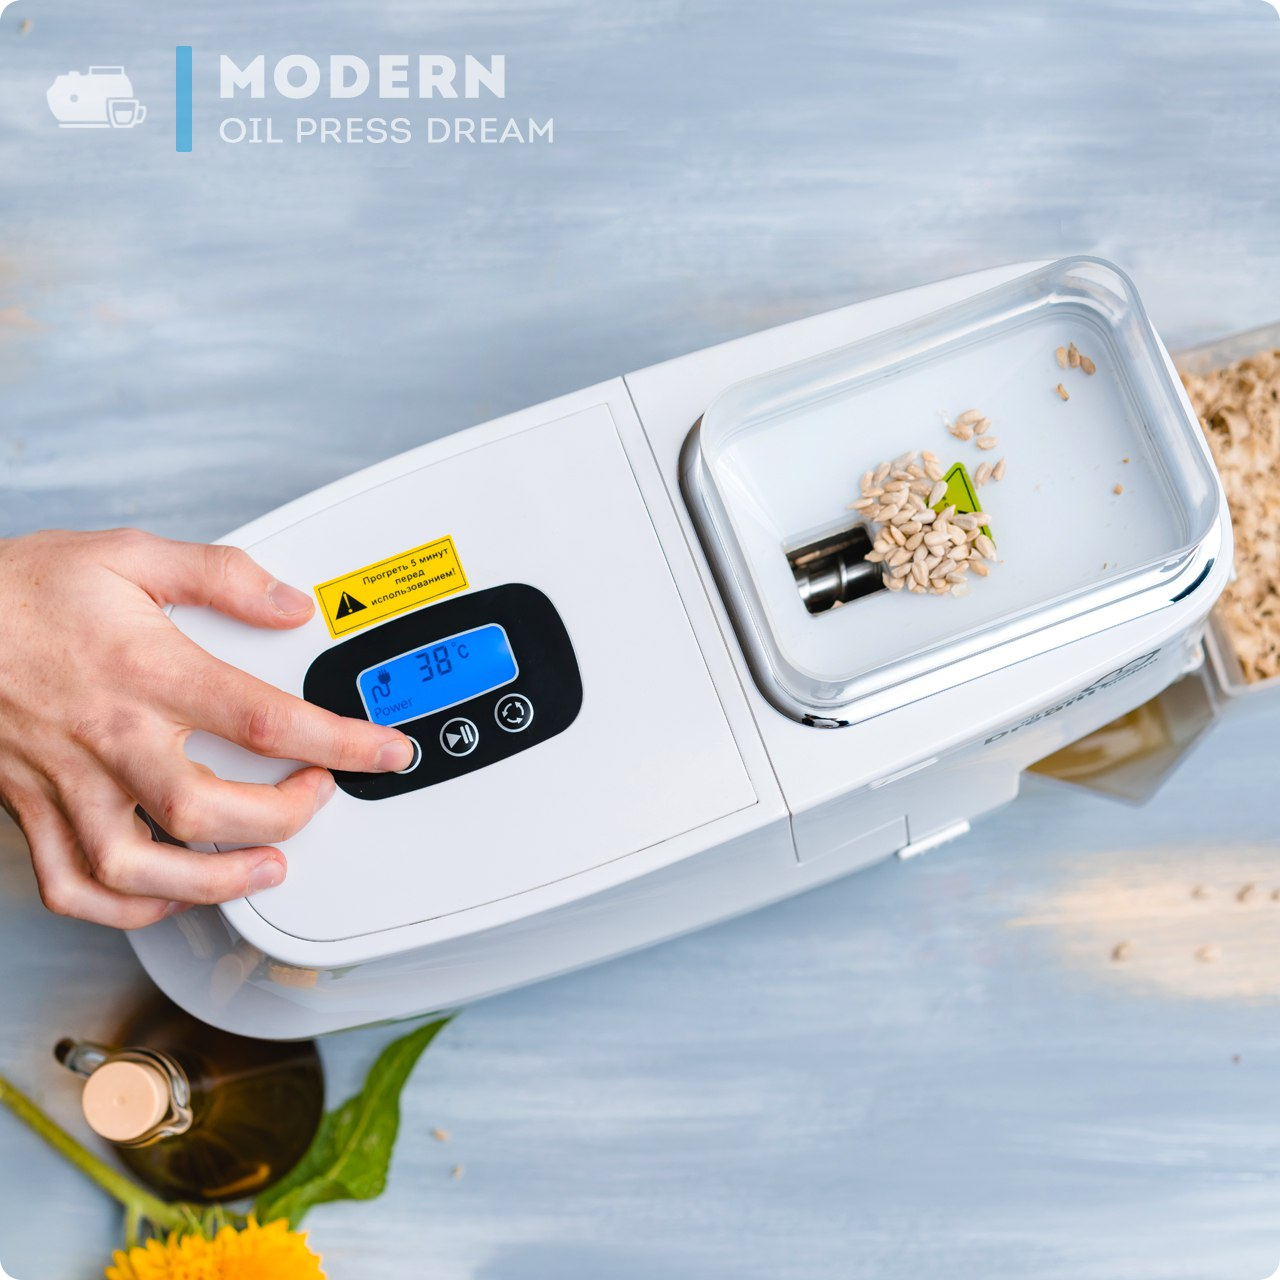 Маслопресс для дома электрический Rawmid Dream Modern ODM-01